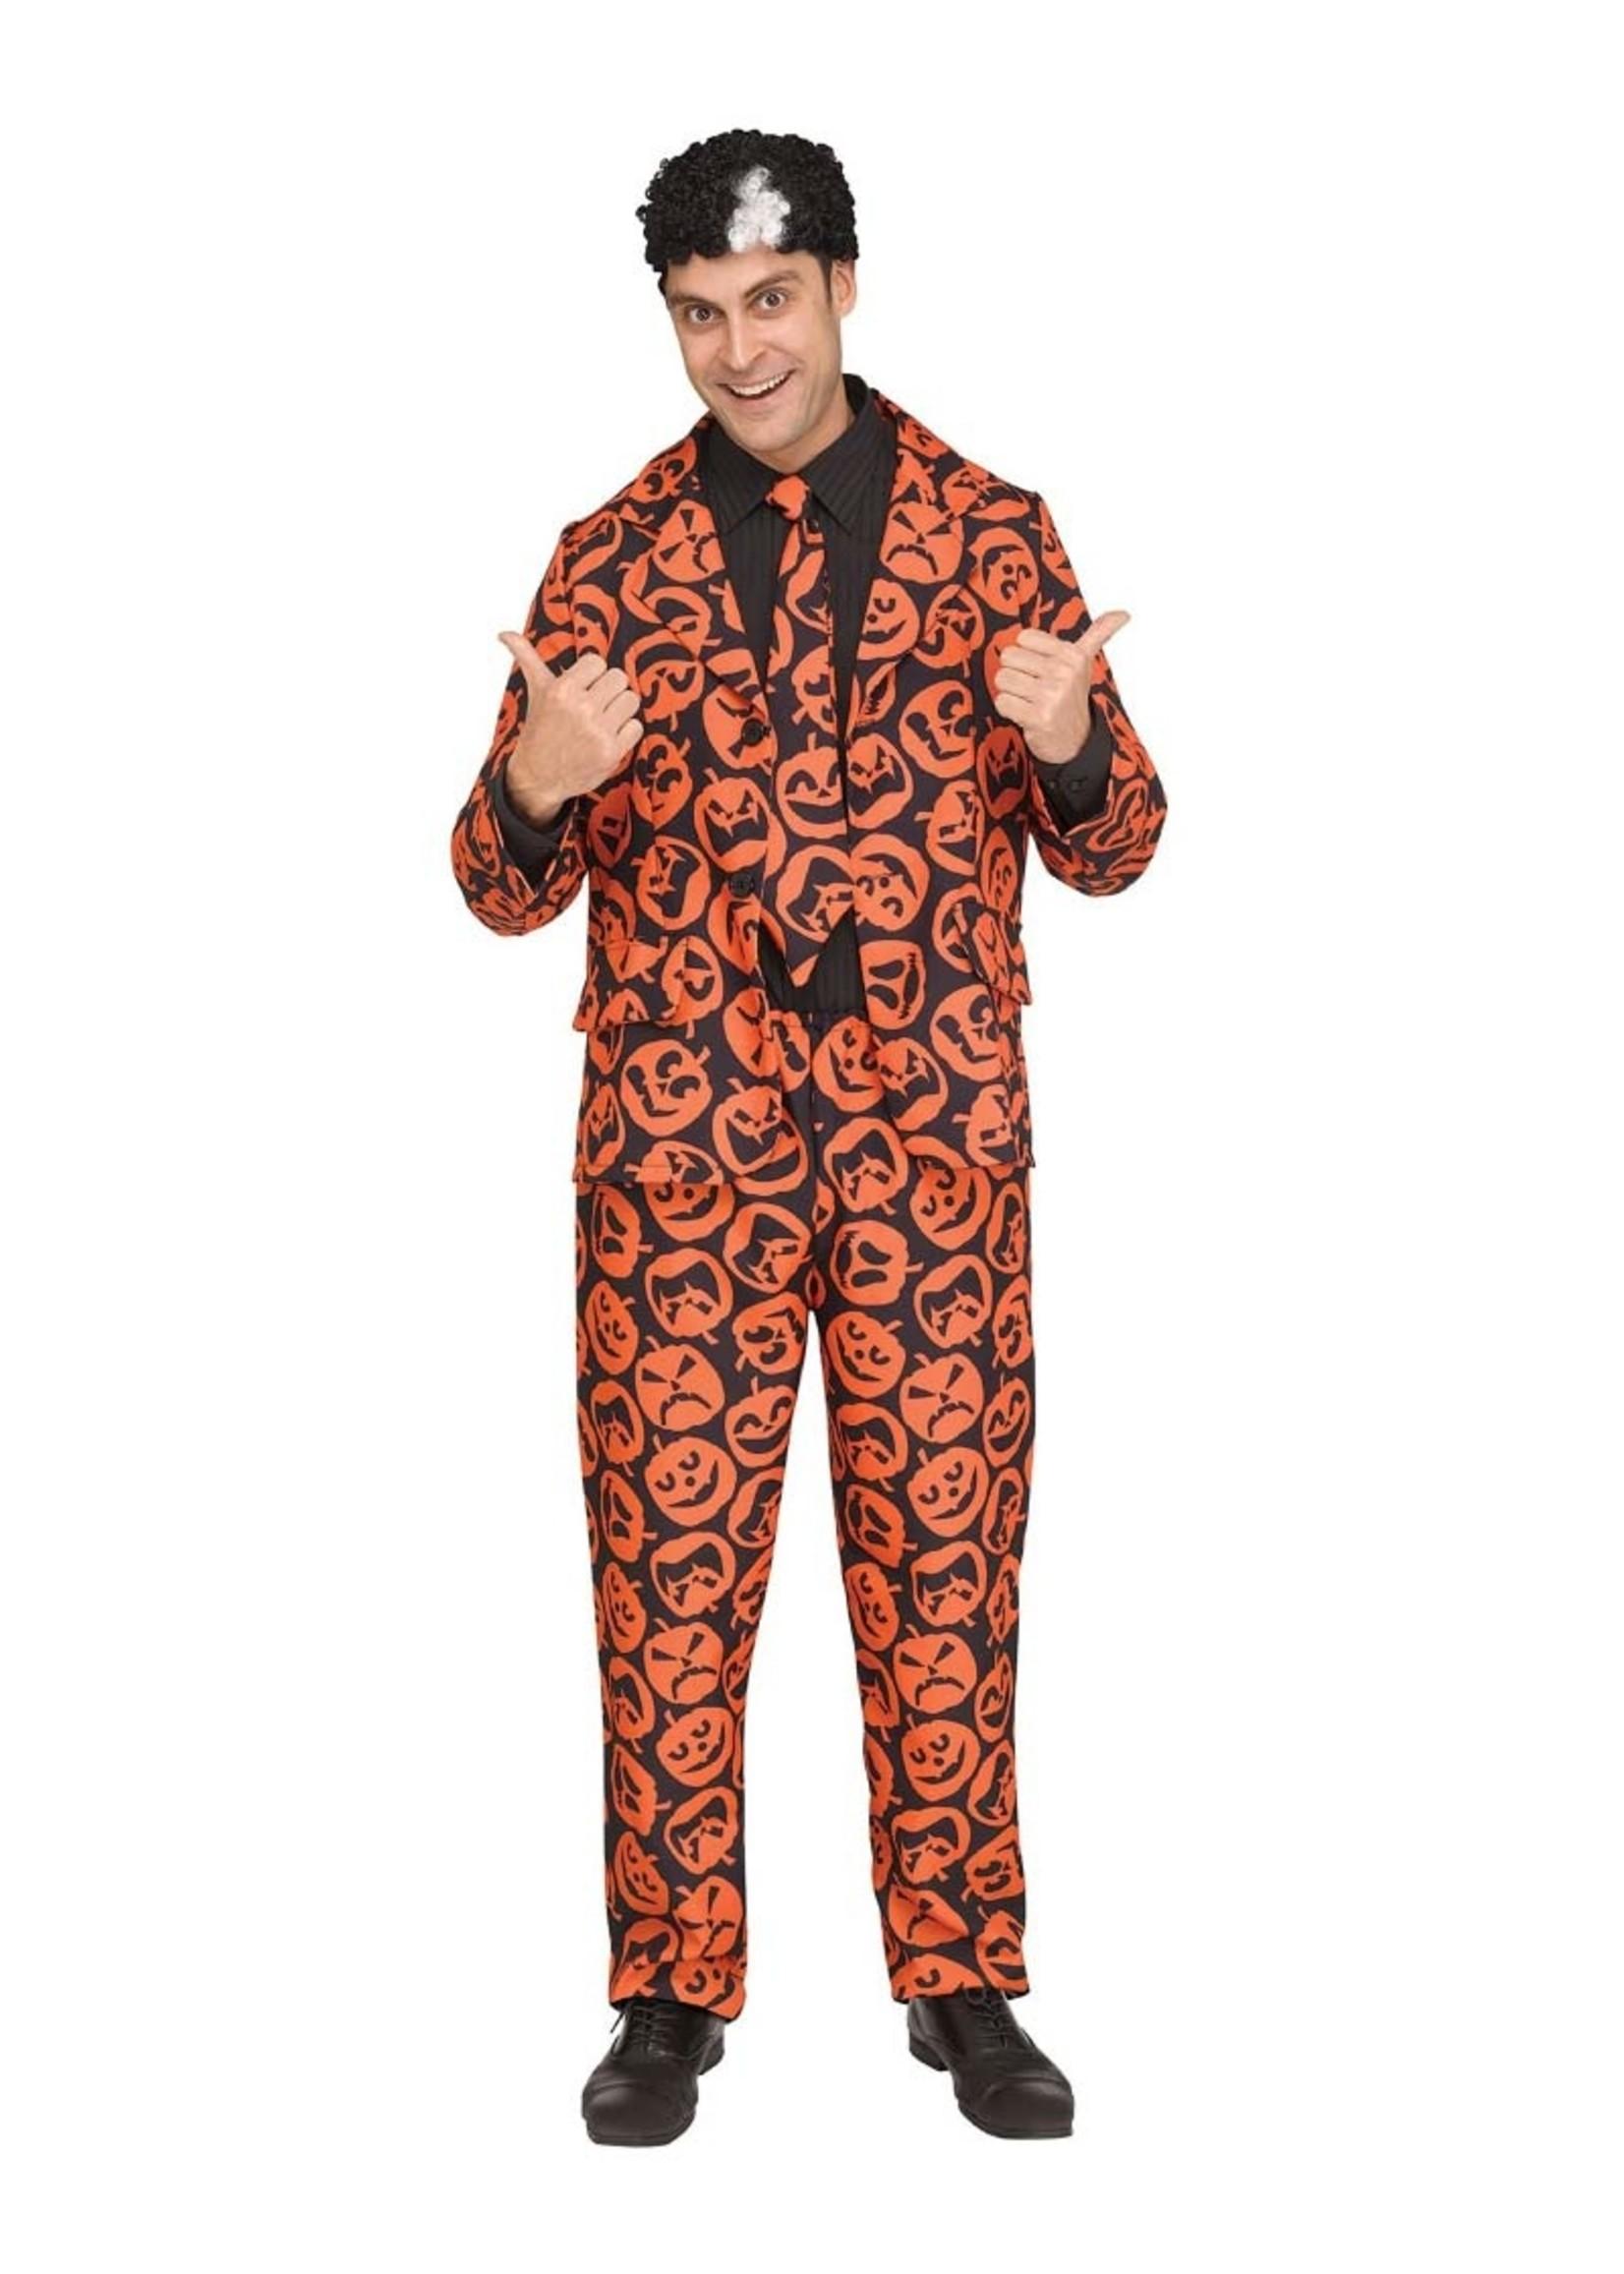 FUN WORLD David S Pumpkins - Men's